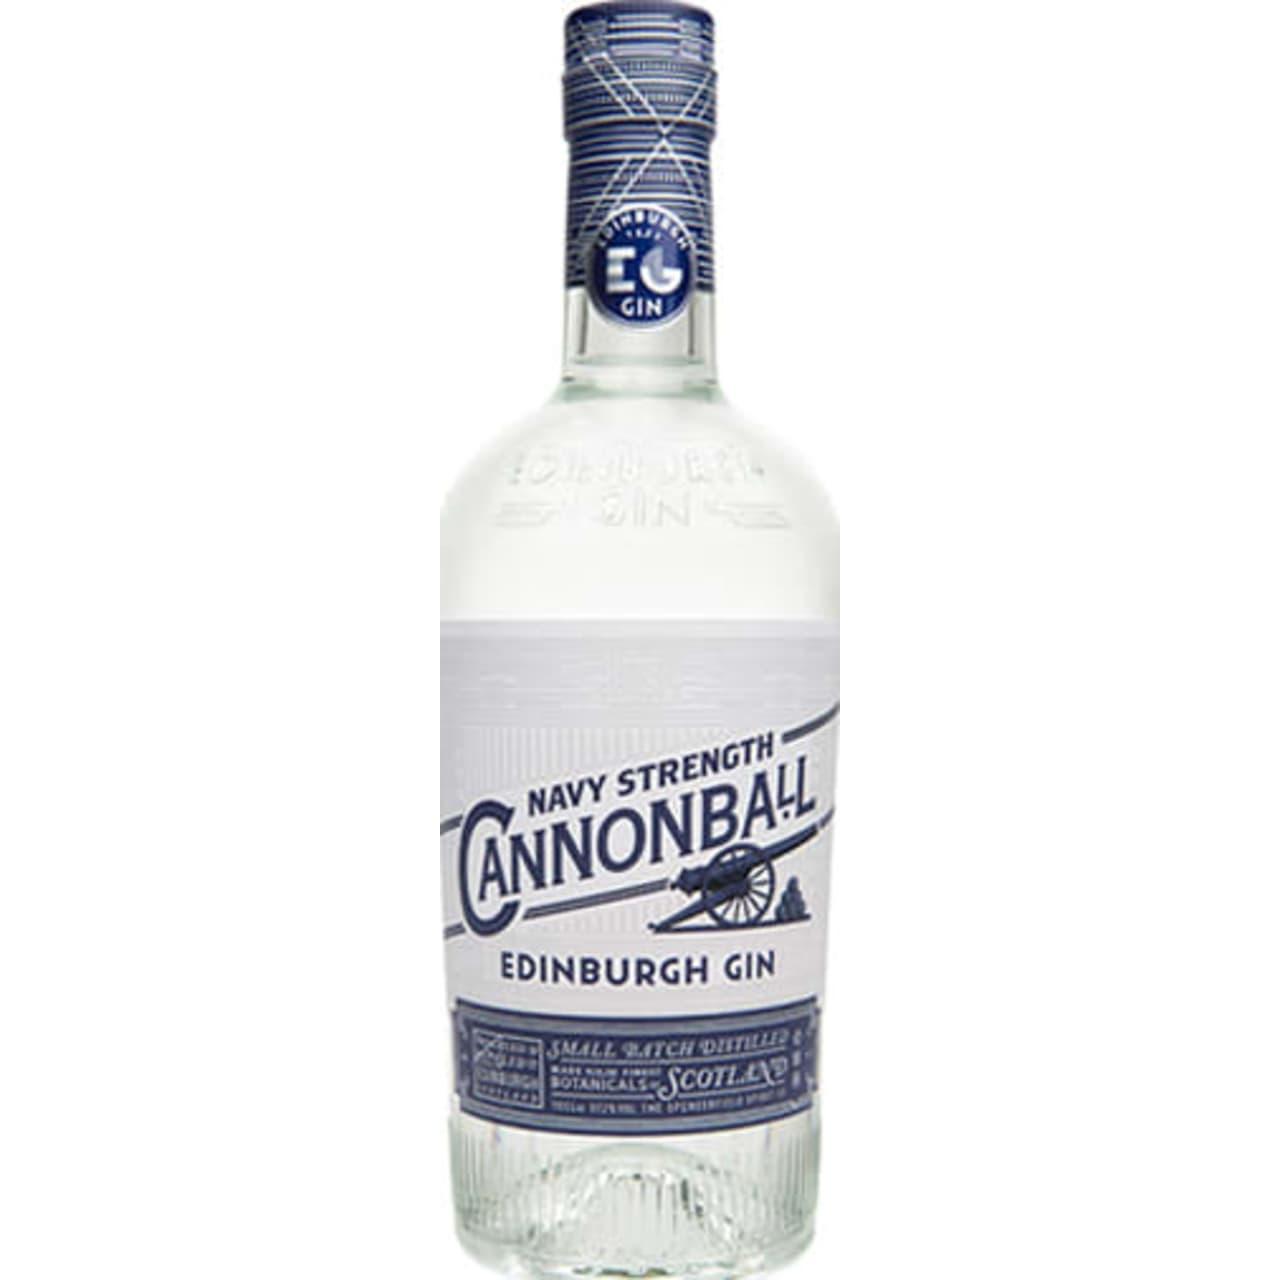 Product Image - Edinburgh Gin Cannonball Navy Strength Gin